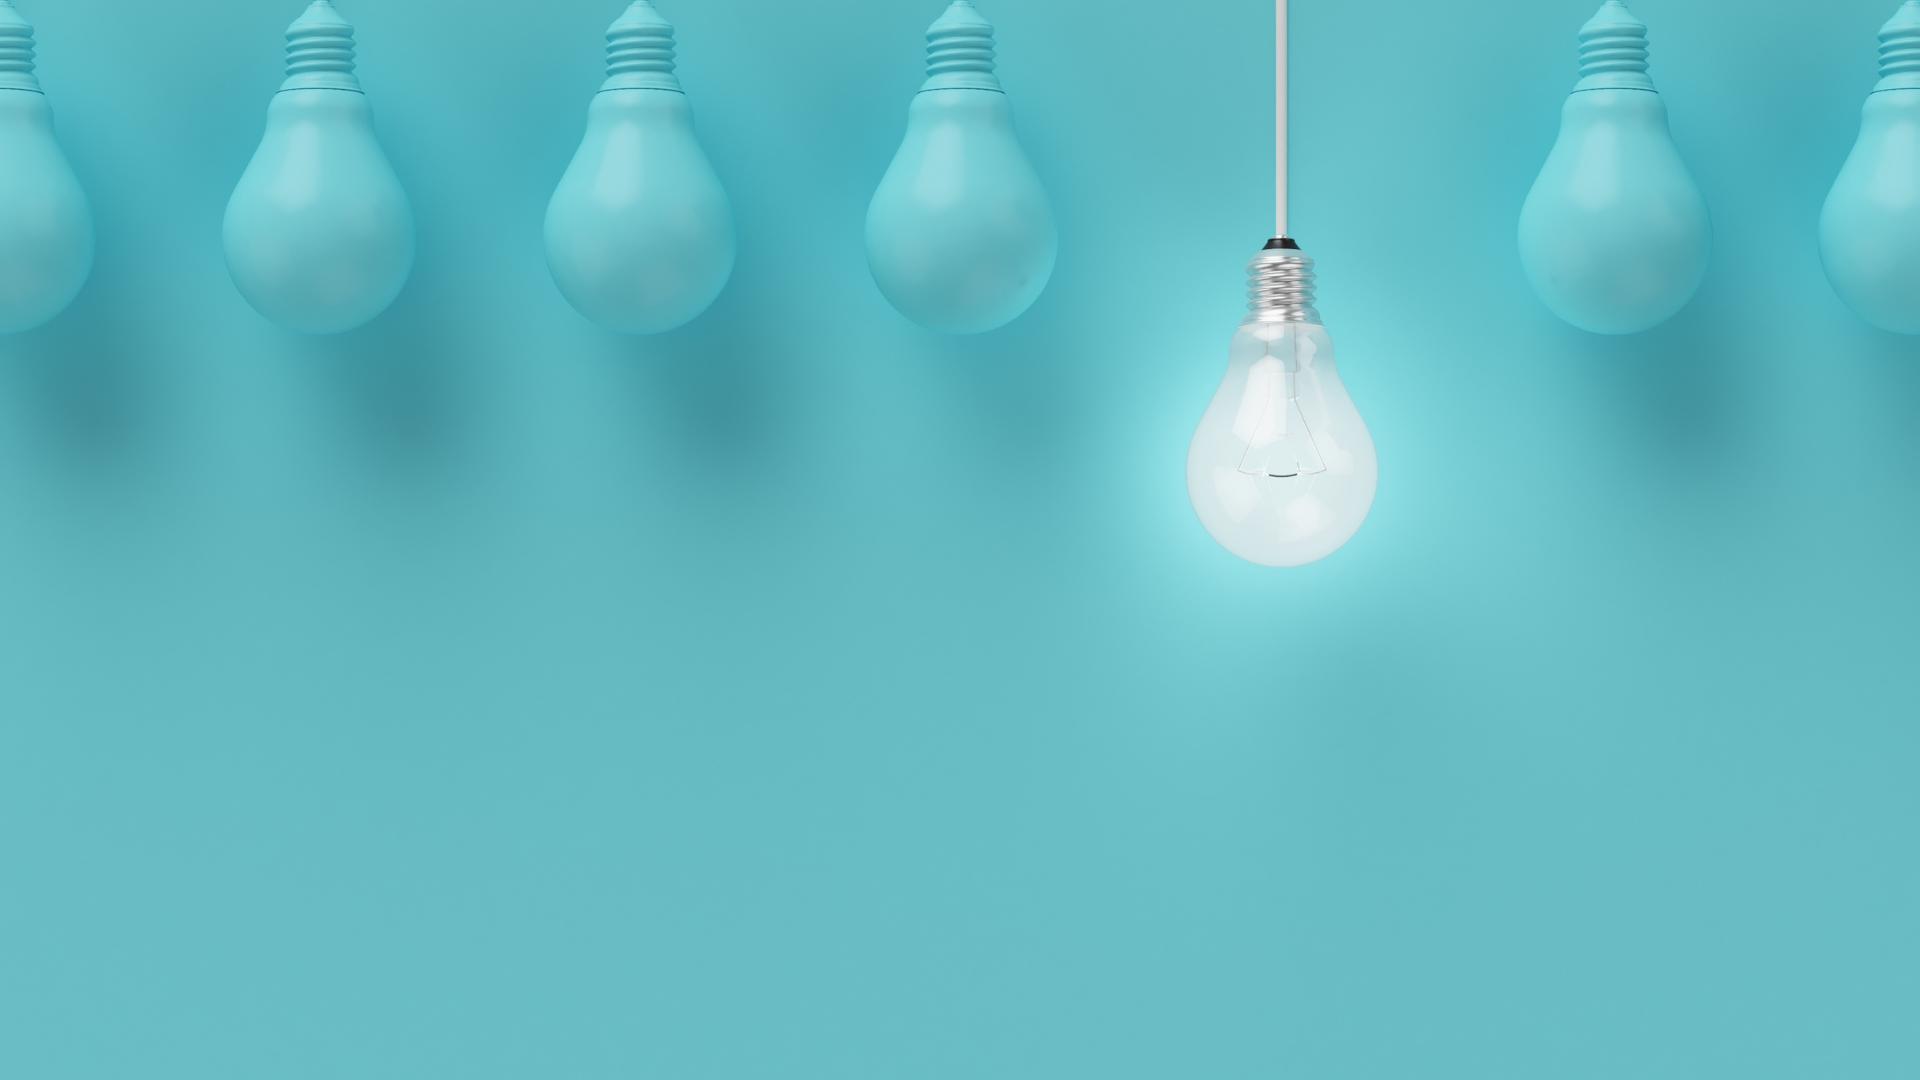 blue-lightbulbs-with-one-bright-lightbulb